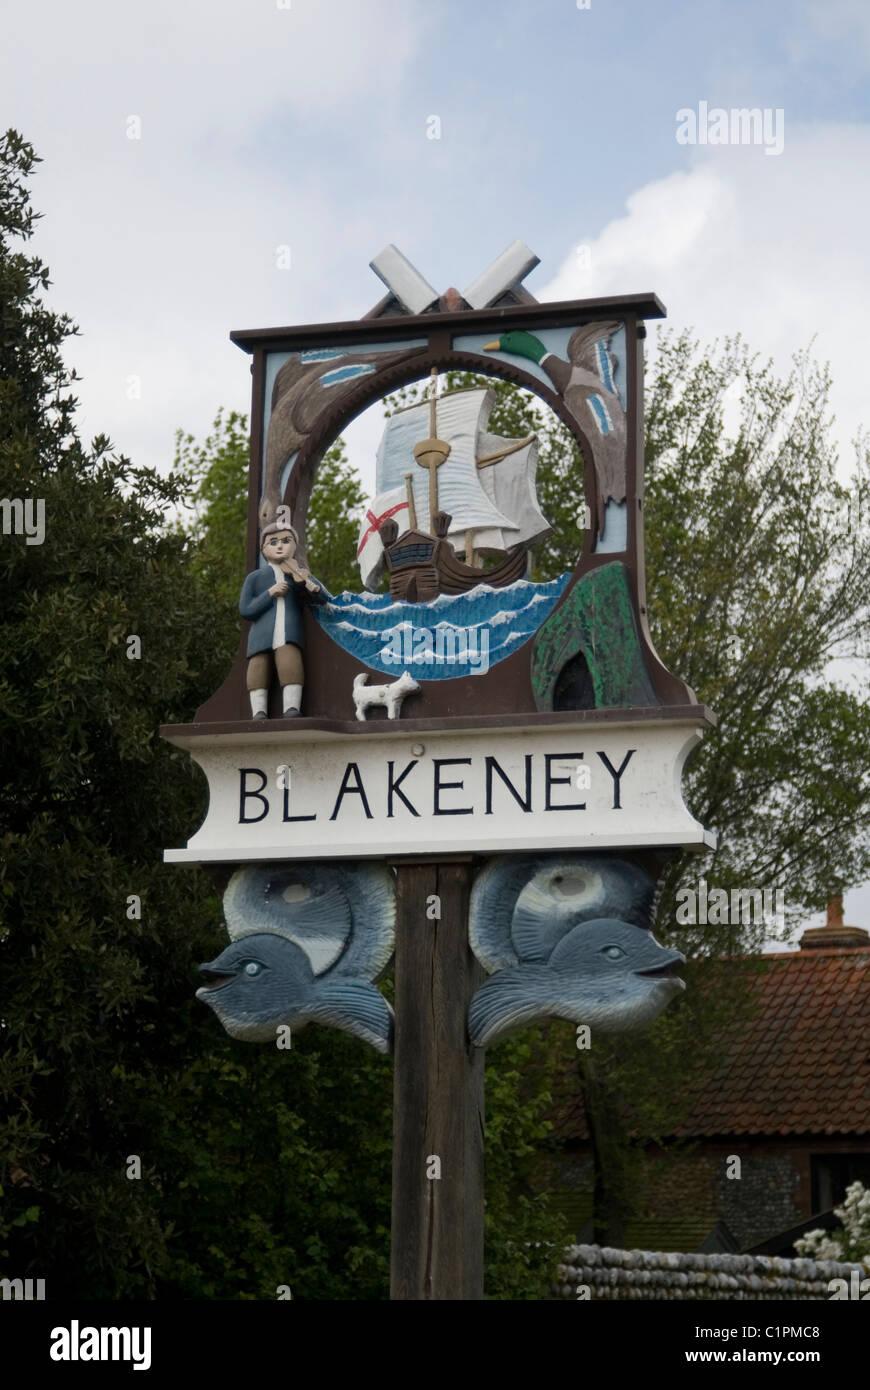 England, Norfolk, Blakeney, village sign - Stock Image